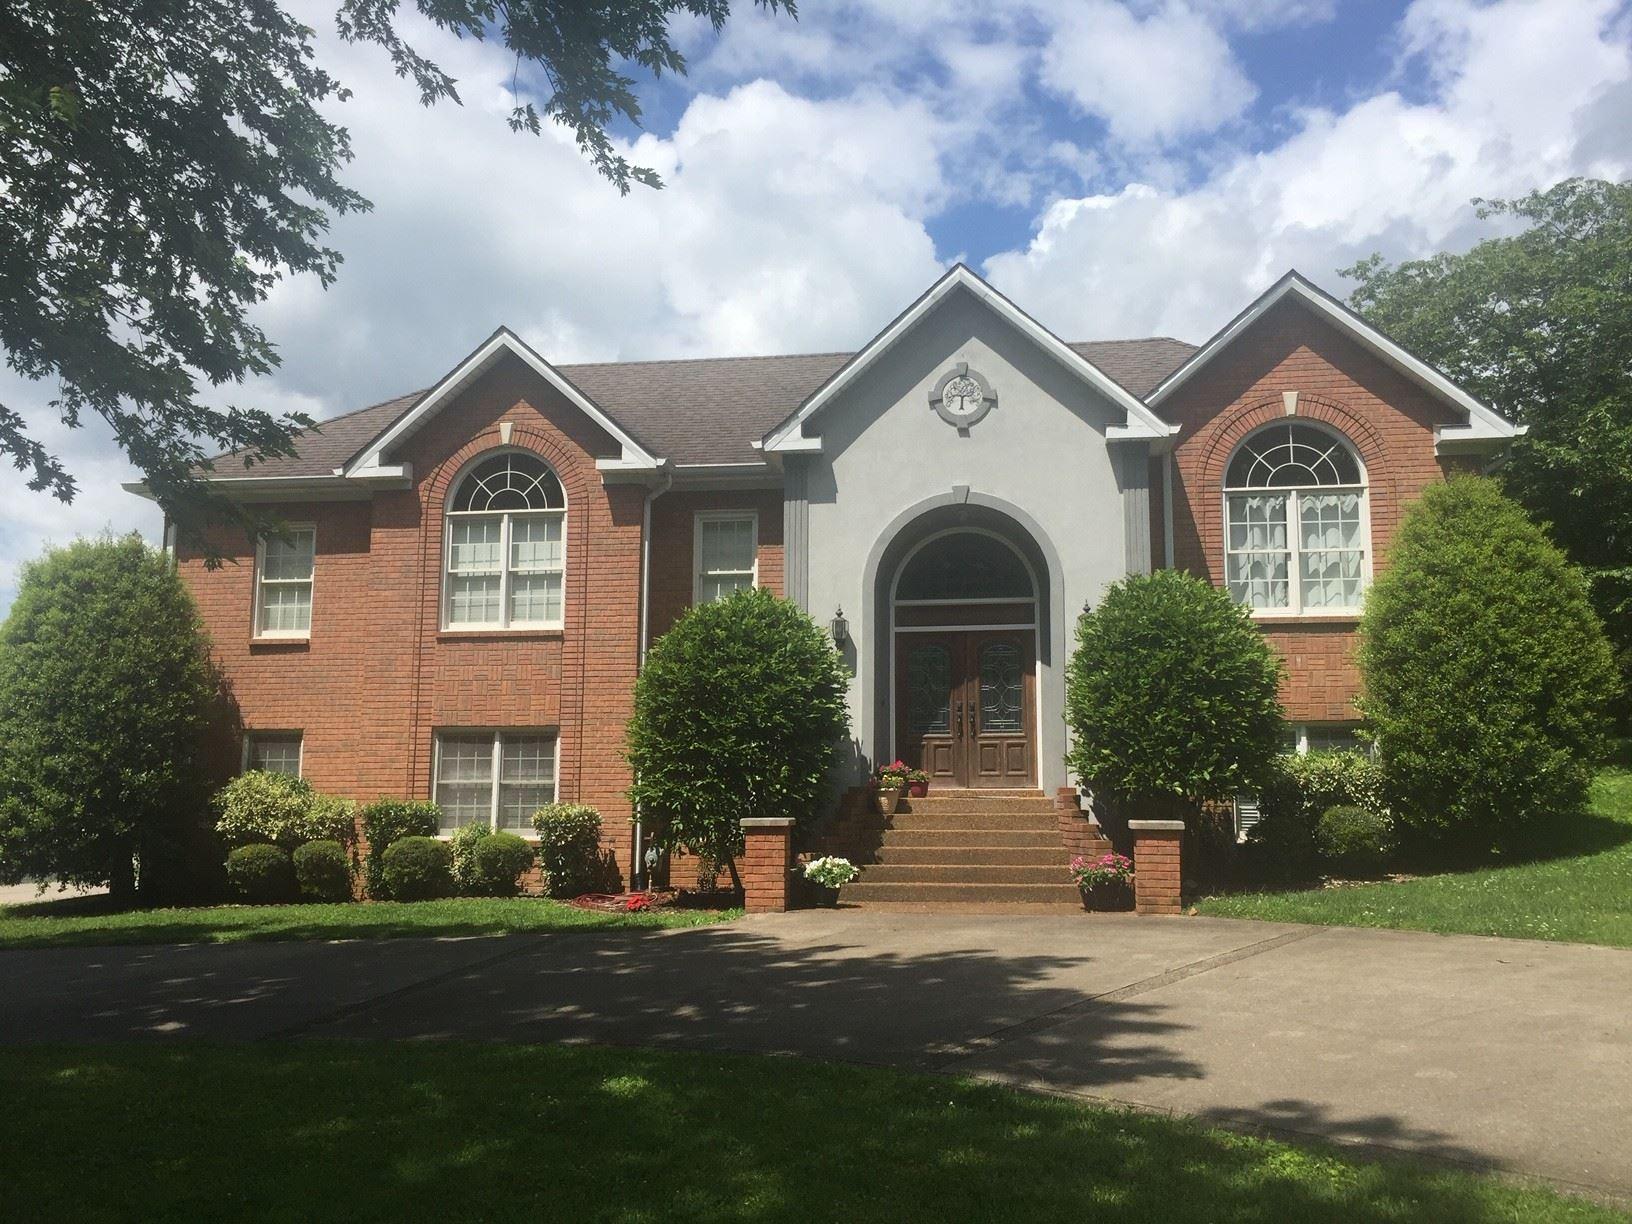 Photo of 513 Treemont Trl, Springfield, TN 37172 (MLS # 2155496)